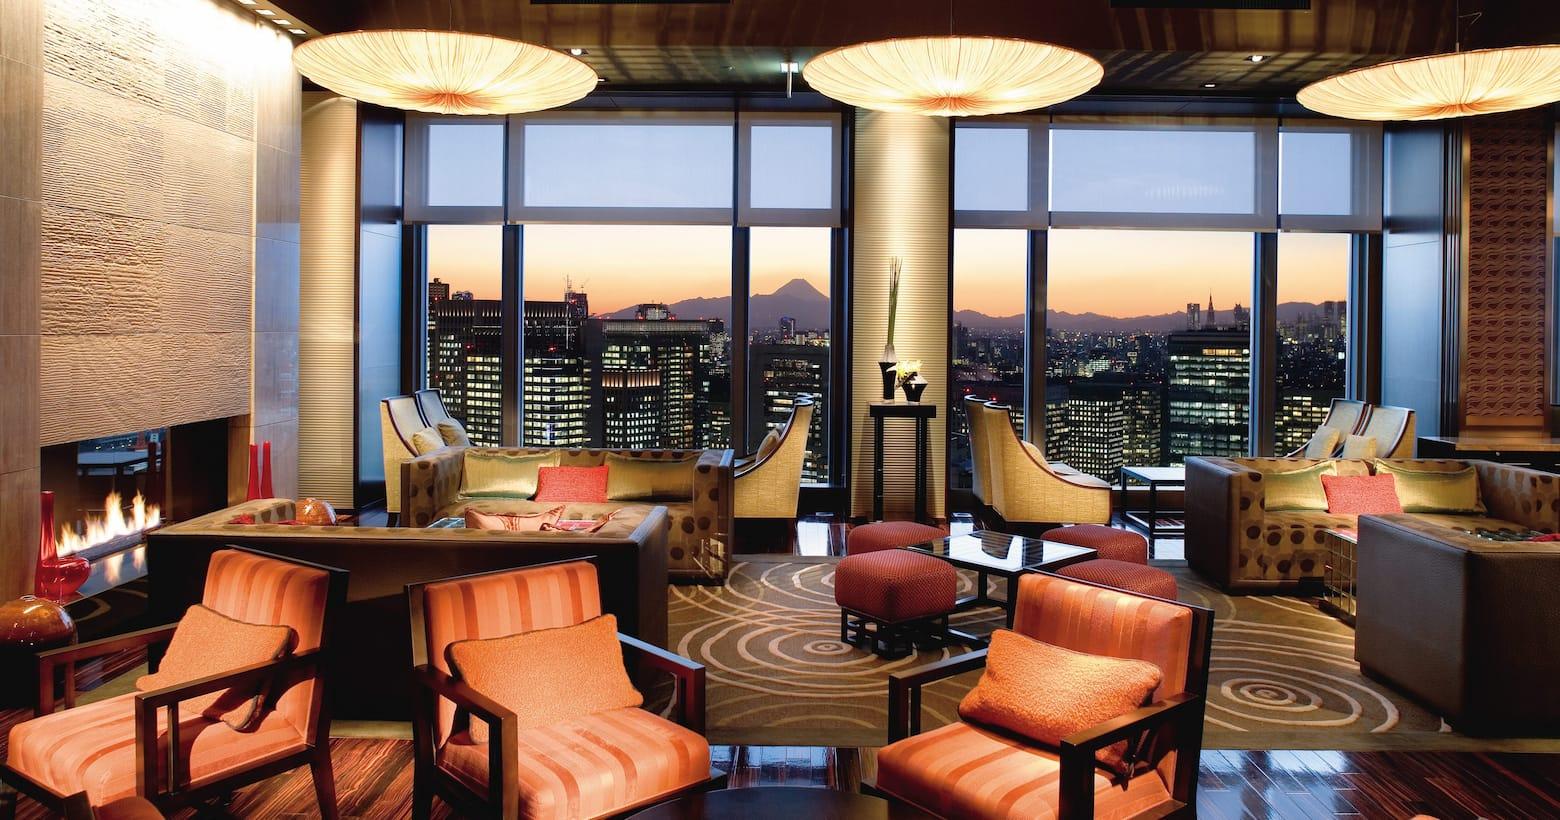 Oriental Lounge interior